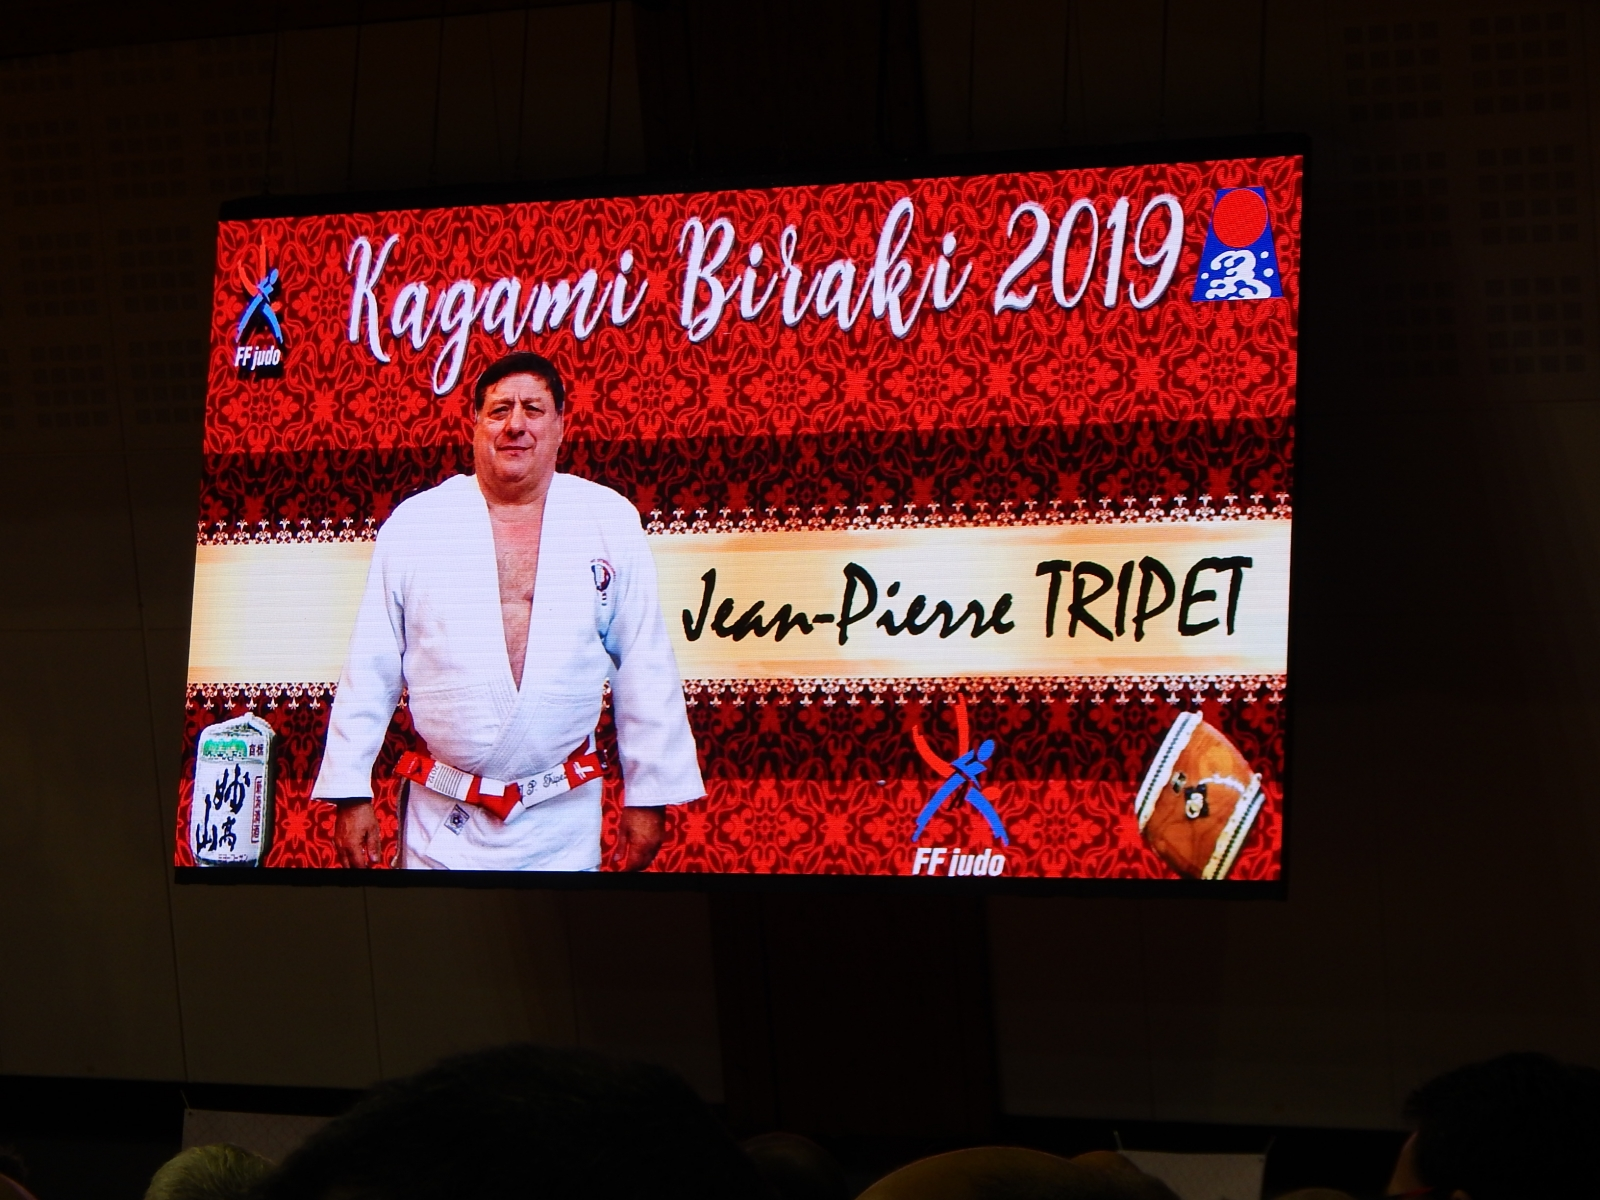 Kagami Biraki 2019 - Paris